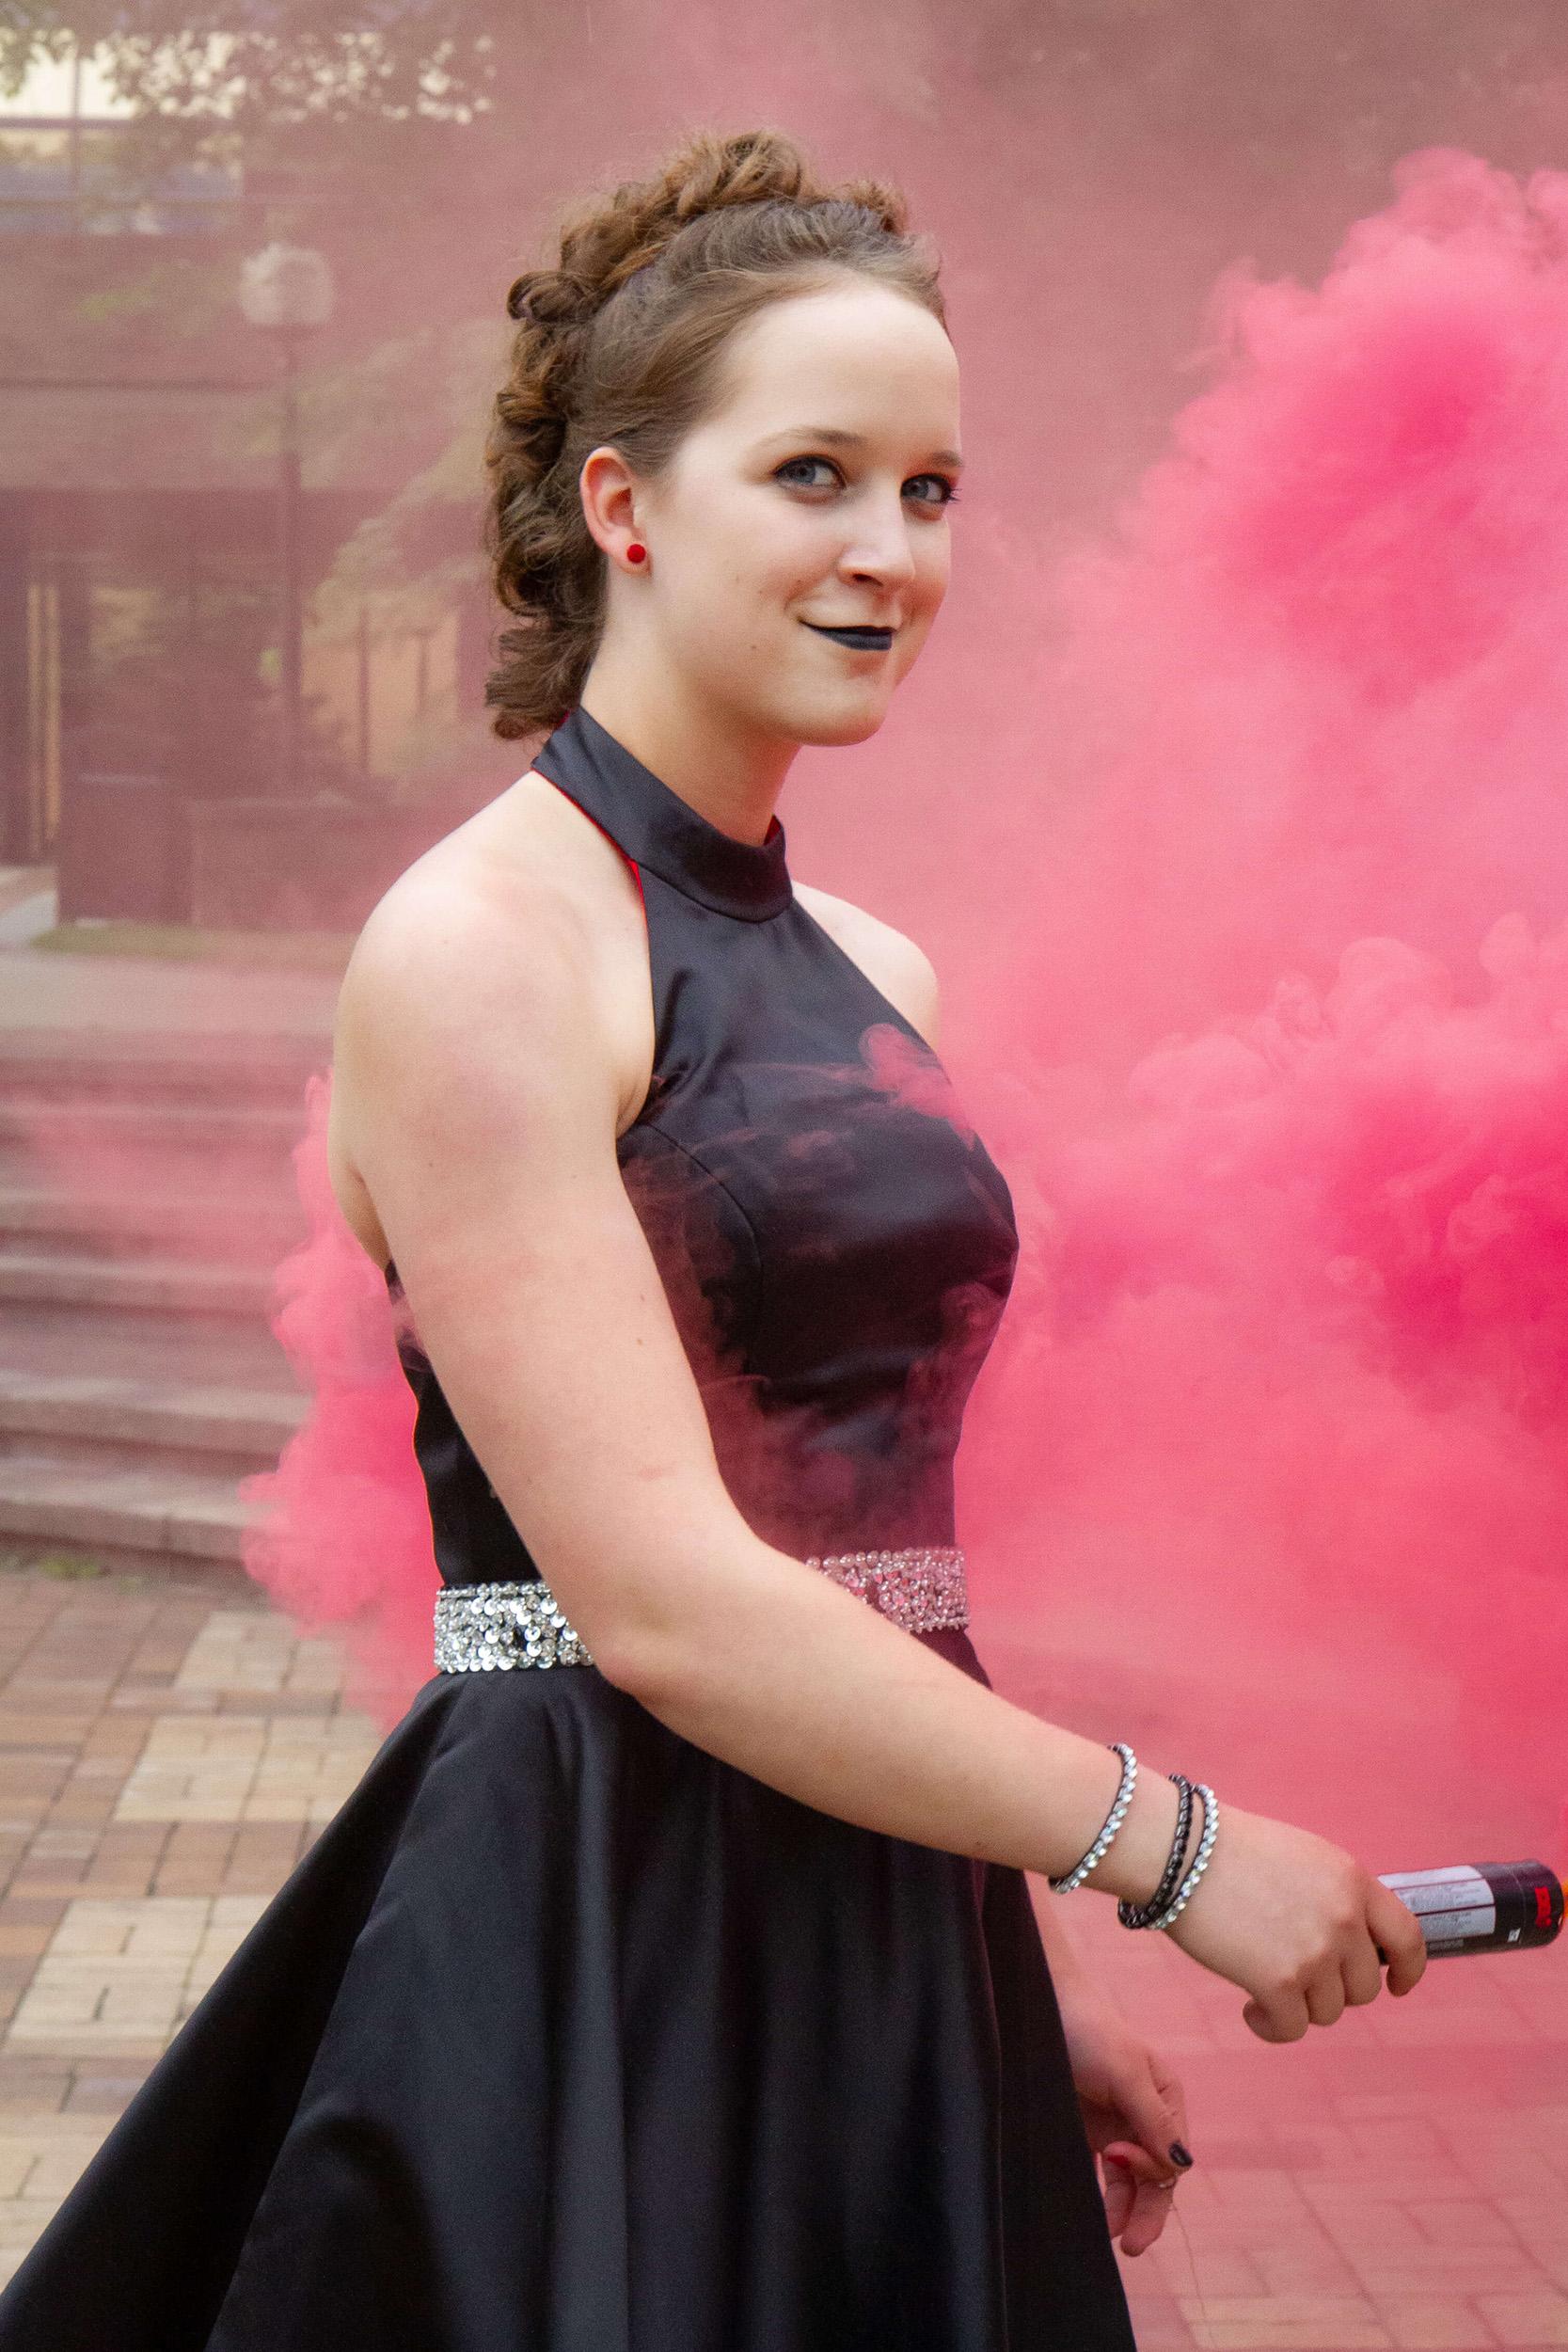 Saskatoon Formal Grad Prom female black dress Boffins Gardens smoke bomb